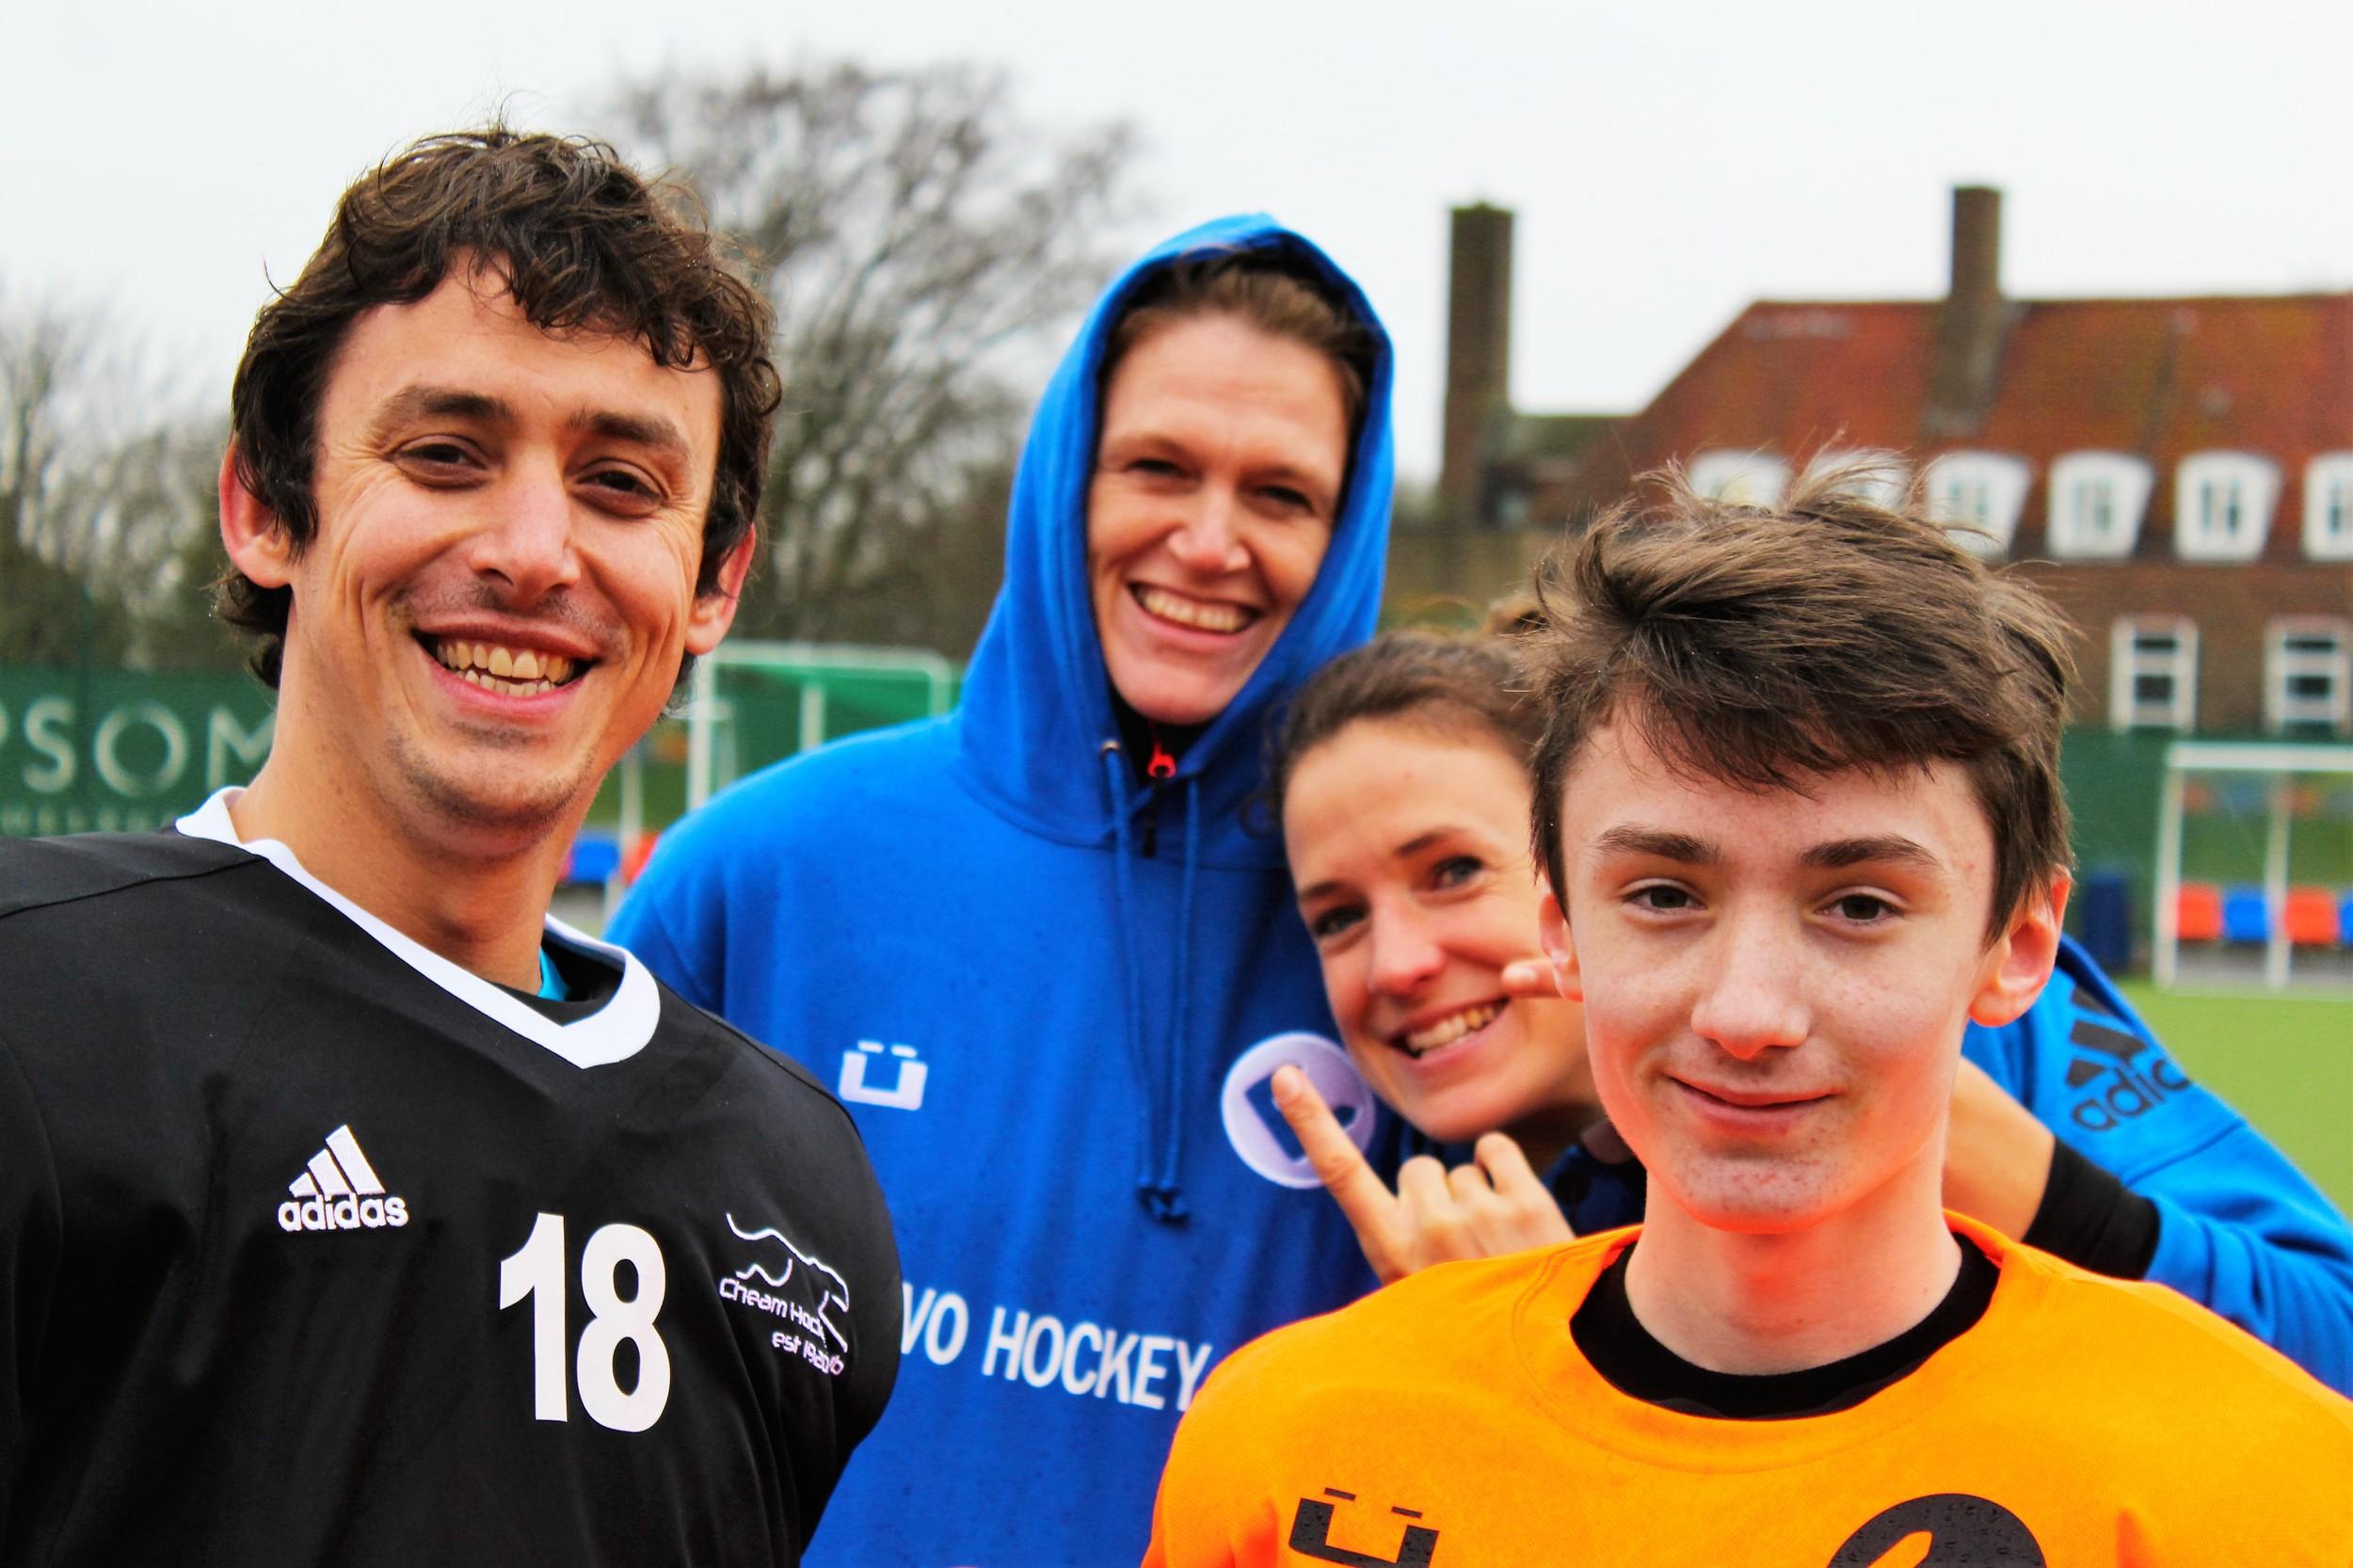 Goalkeeping prizewinner Cameron Mason-Apps gets photobombed by EVO coaches Janne Müller-Wieland, Yvi Frank & Charlie Ede